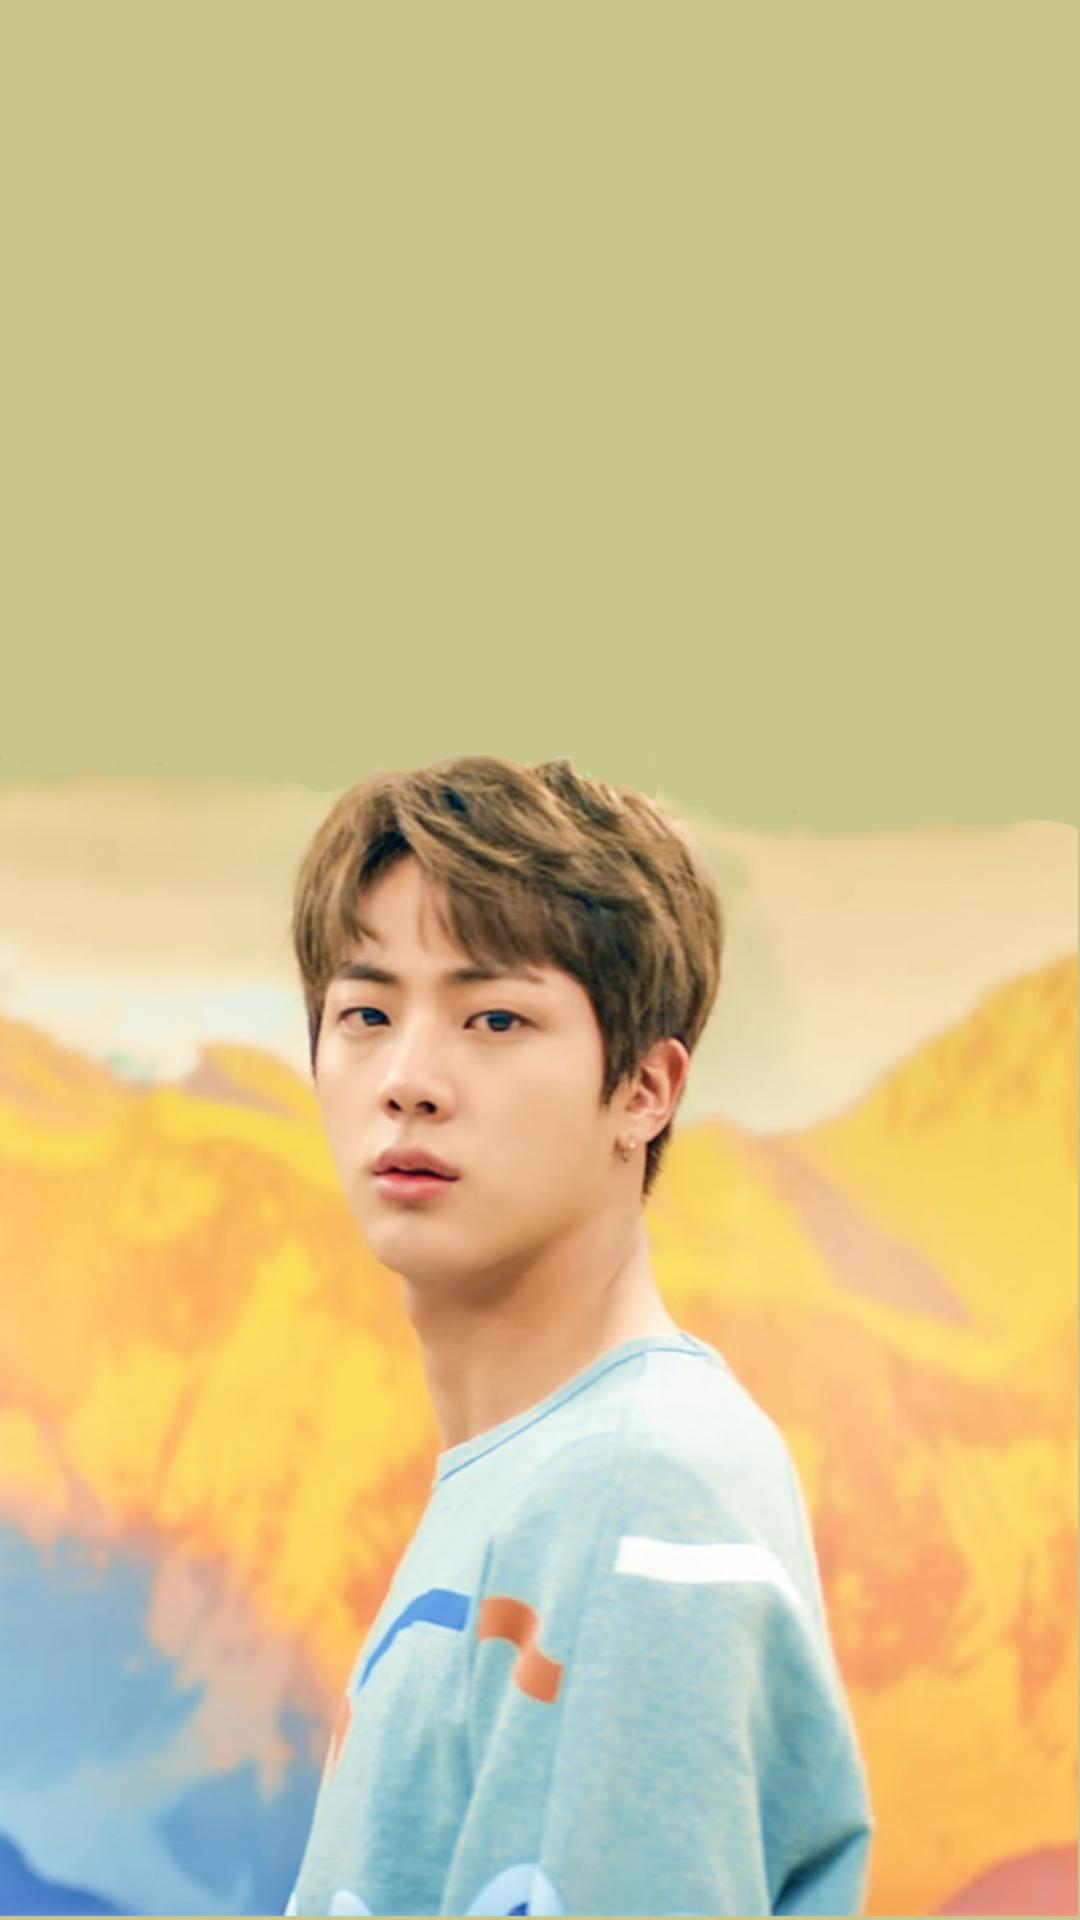 Kim Seokjin Spring Day Wallpapers Wallpaper Cave